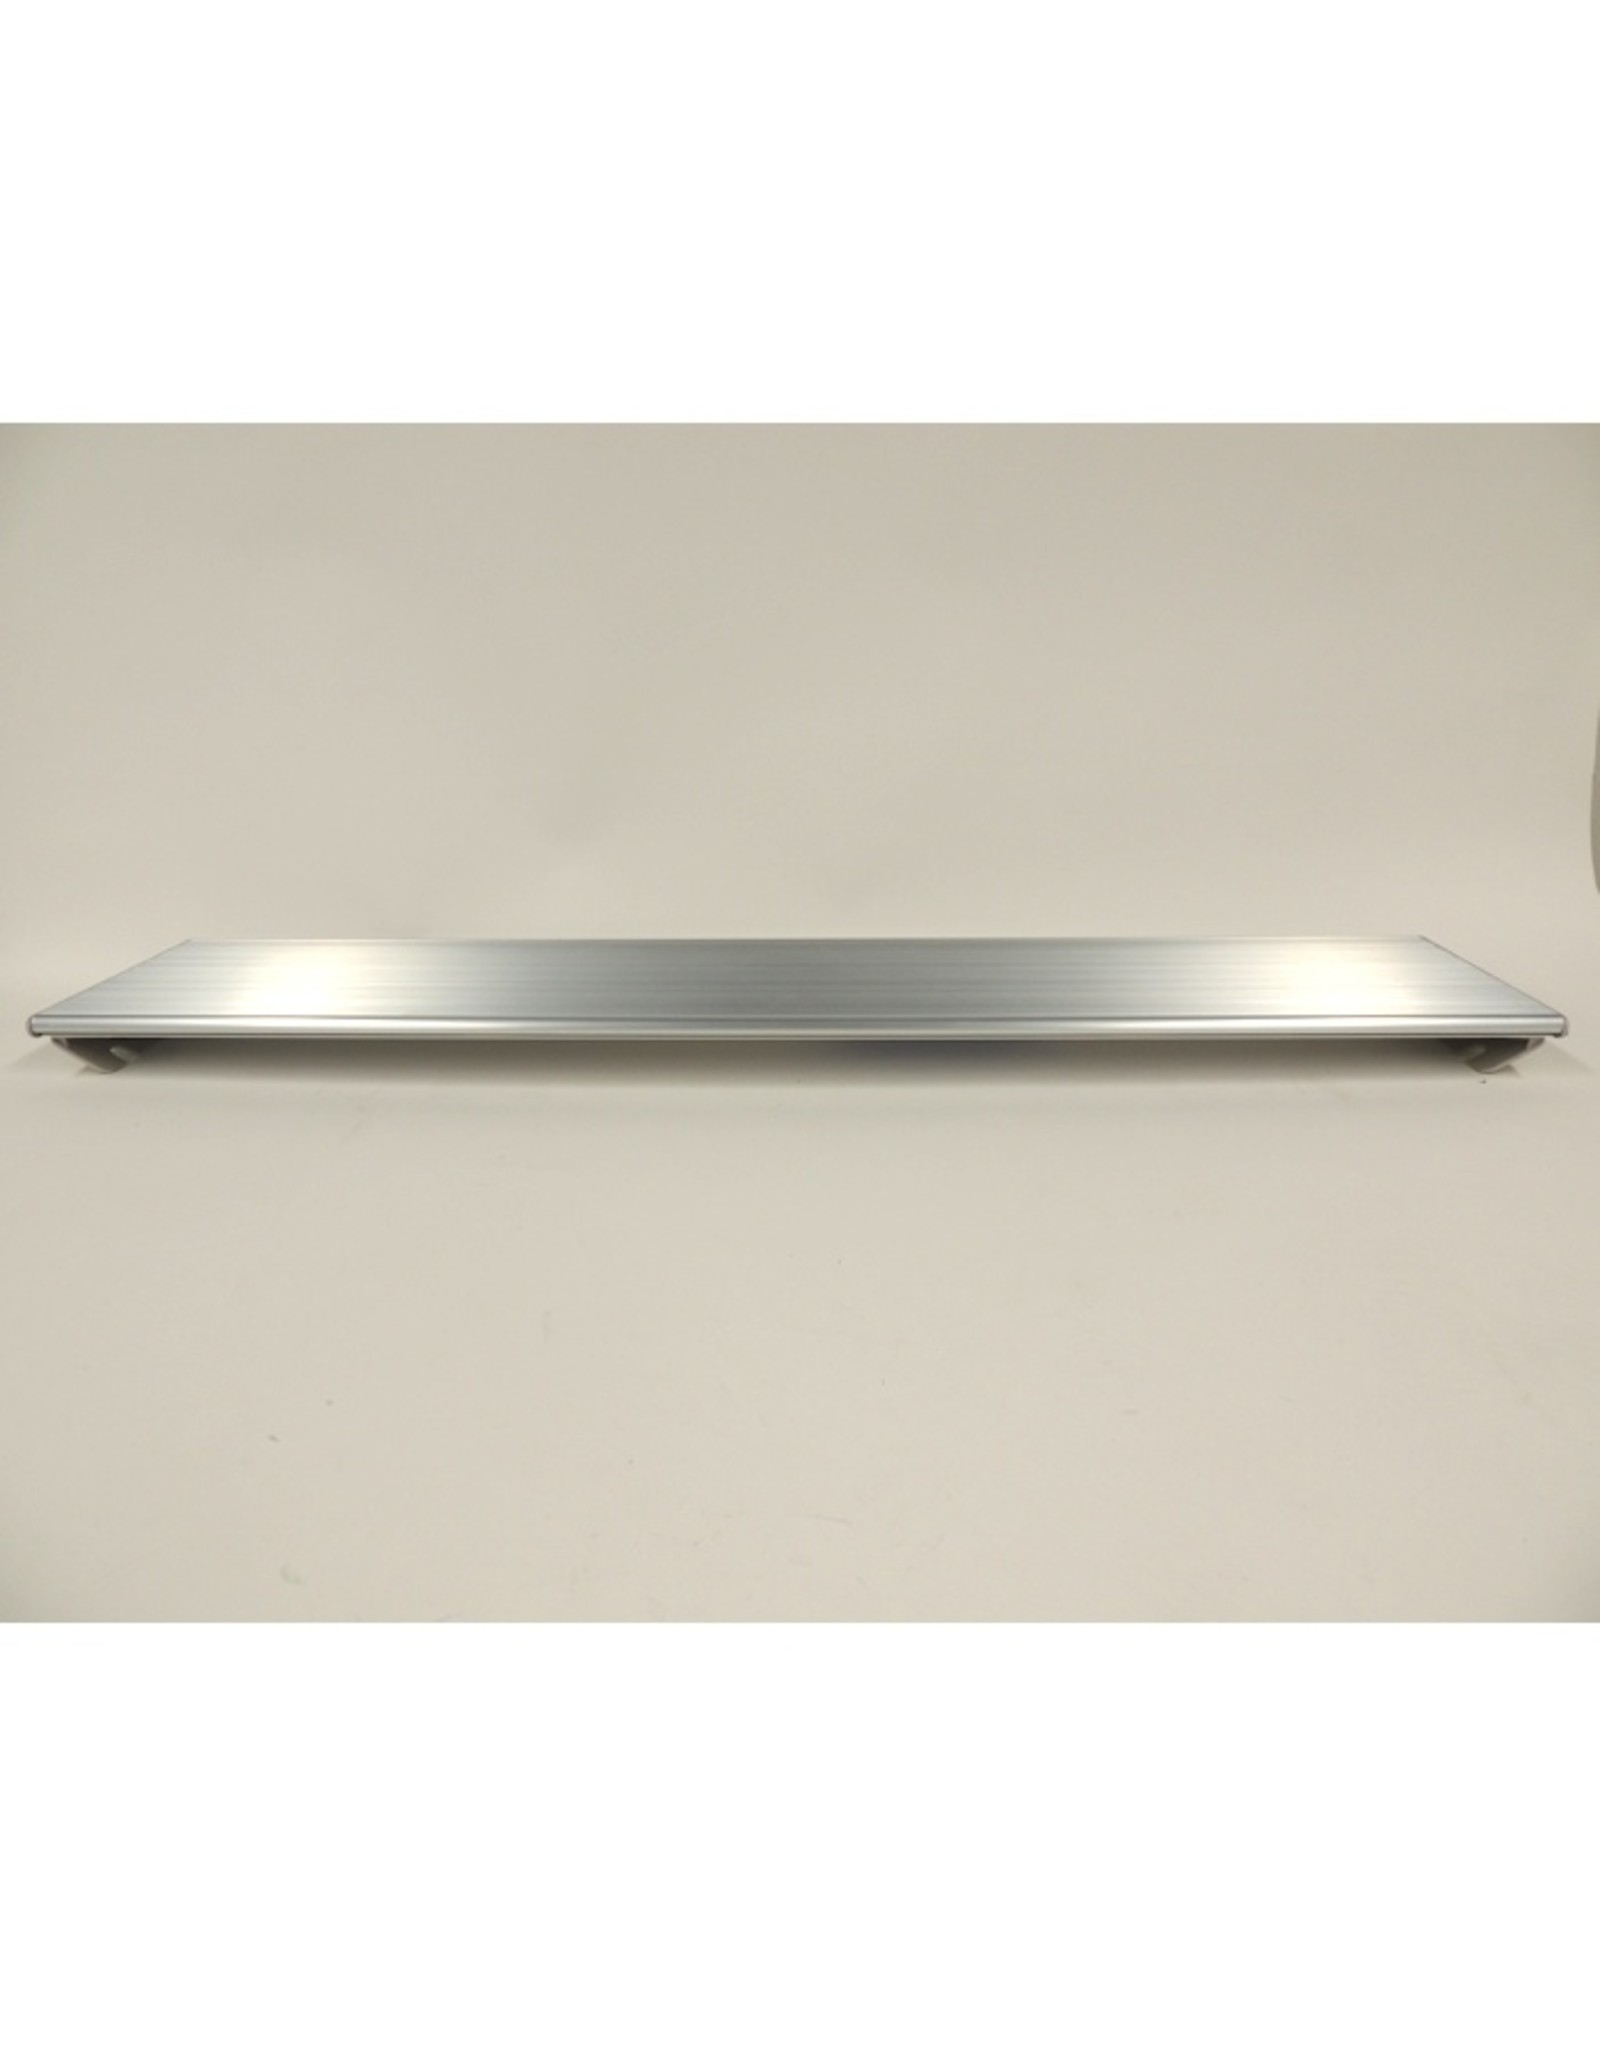 Zodiac Zitplank aluminium 95cm - Cadet ALU / AERO - 270 / 300 / 300DL RIBs